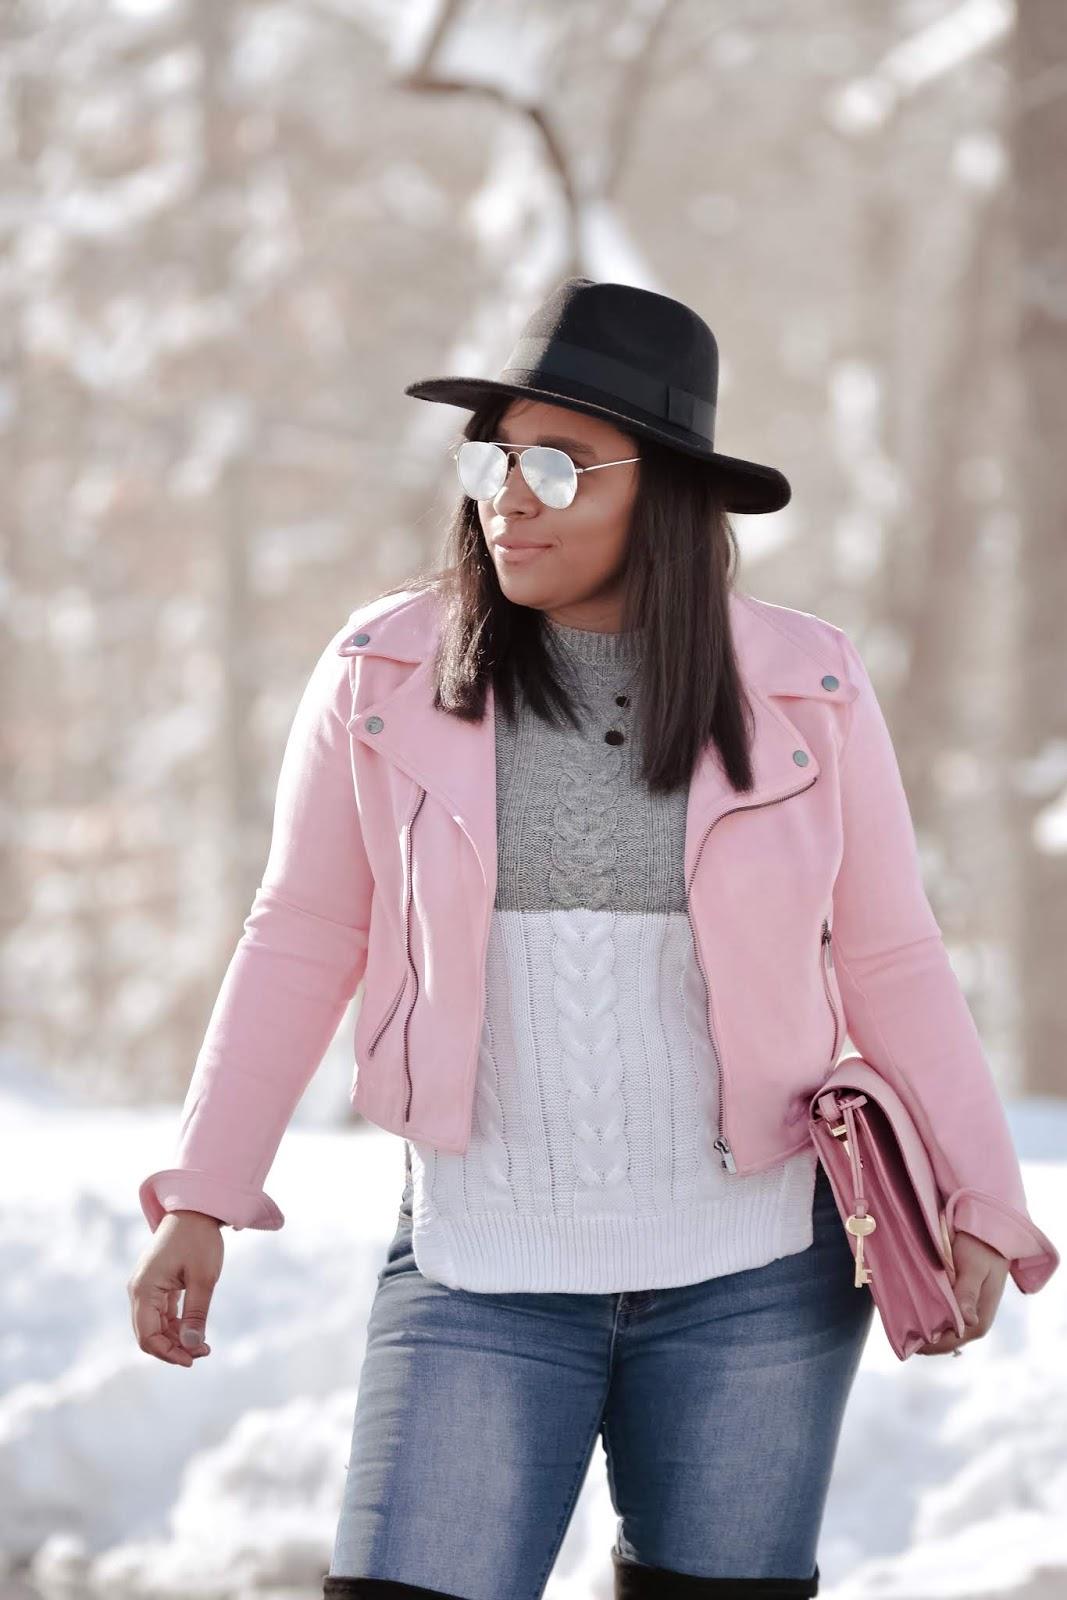 winter wonderland, mom bloggers, fashion bloggers, otk boots, winter hats, pink outfits, pink motto jacket, lookbookstore,knit sweater